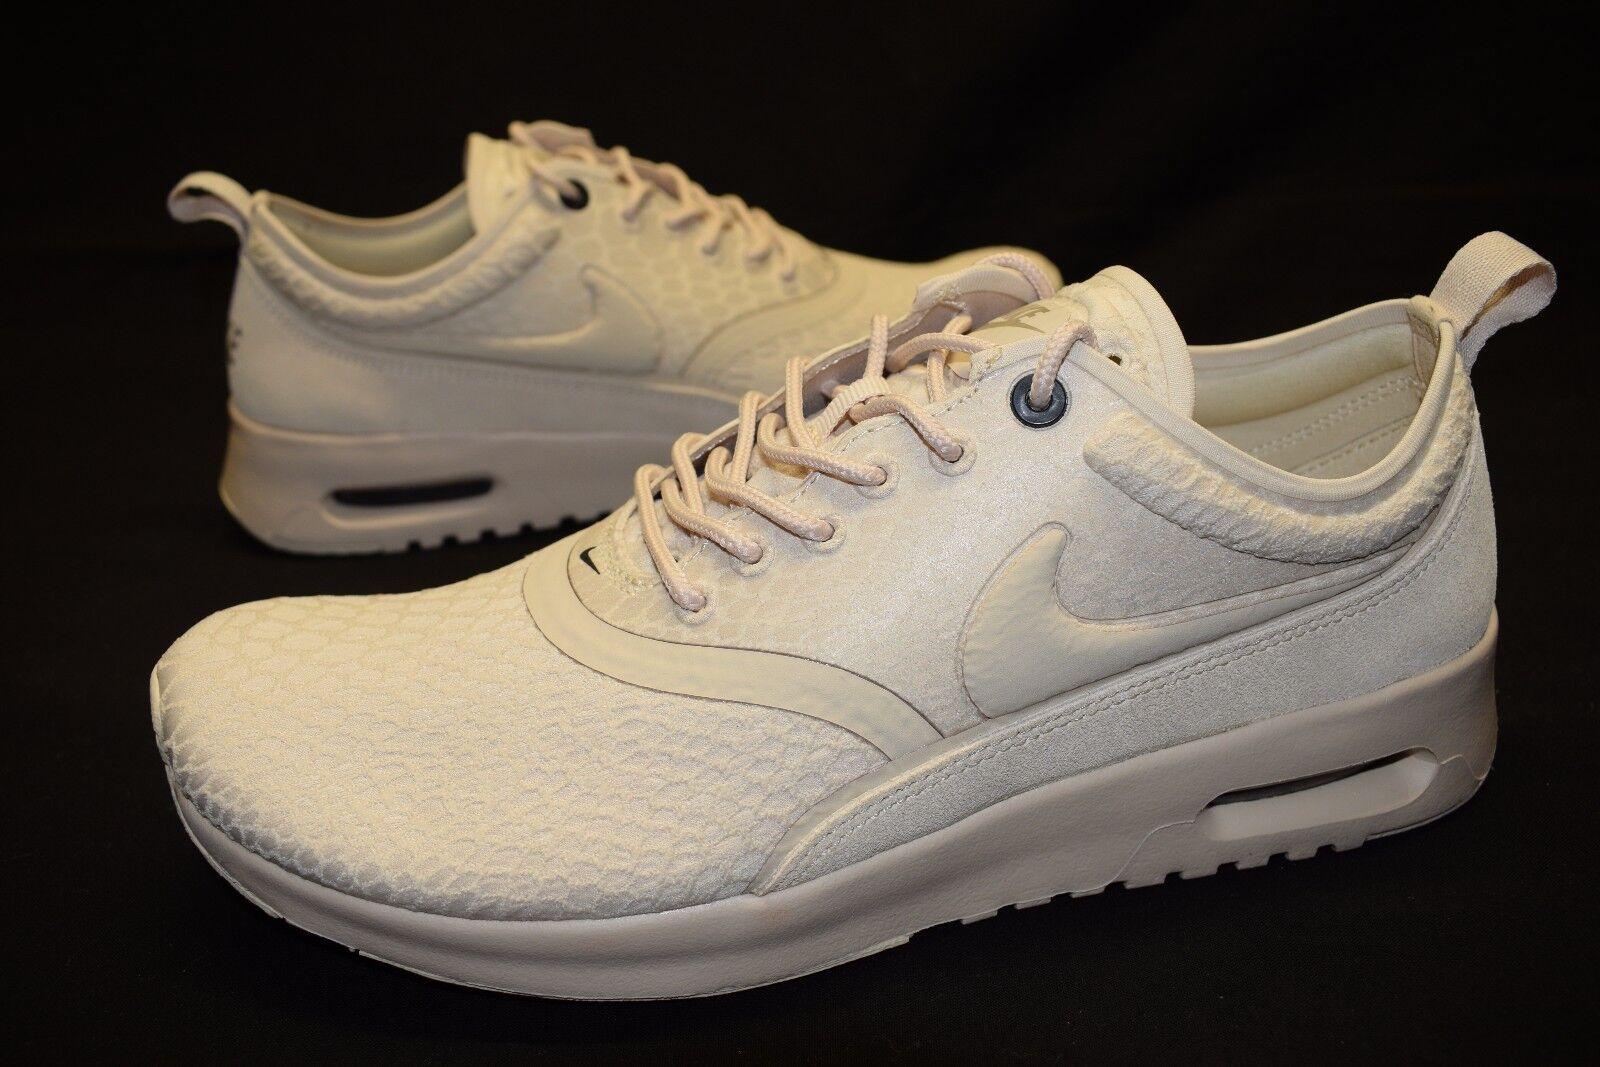 Nike Wouomo Air Max Thea Ultra SE scarpe scarpe da ginnastica 881118 100 Sz US 9 EU 40.5 NEW